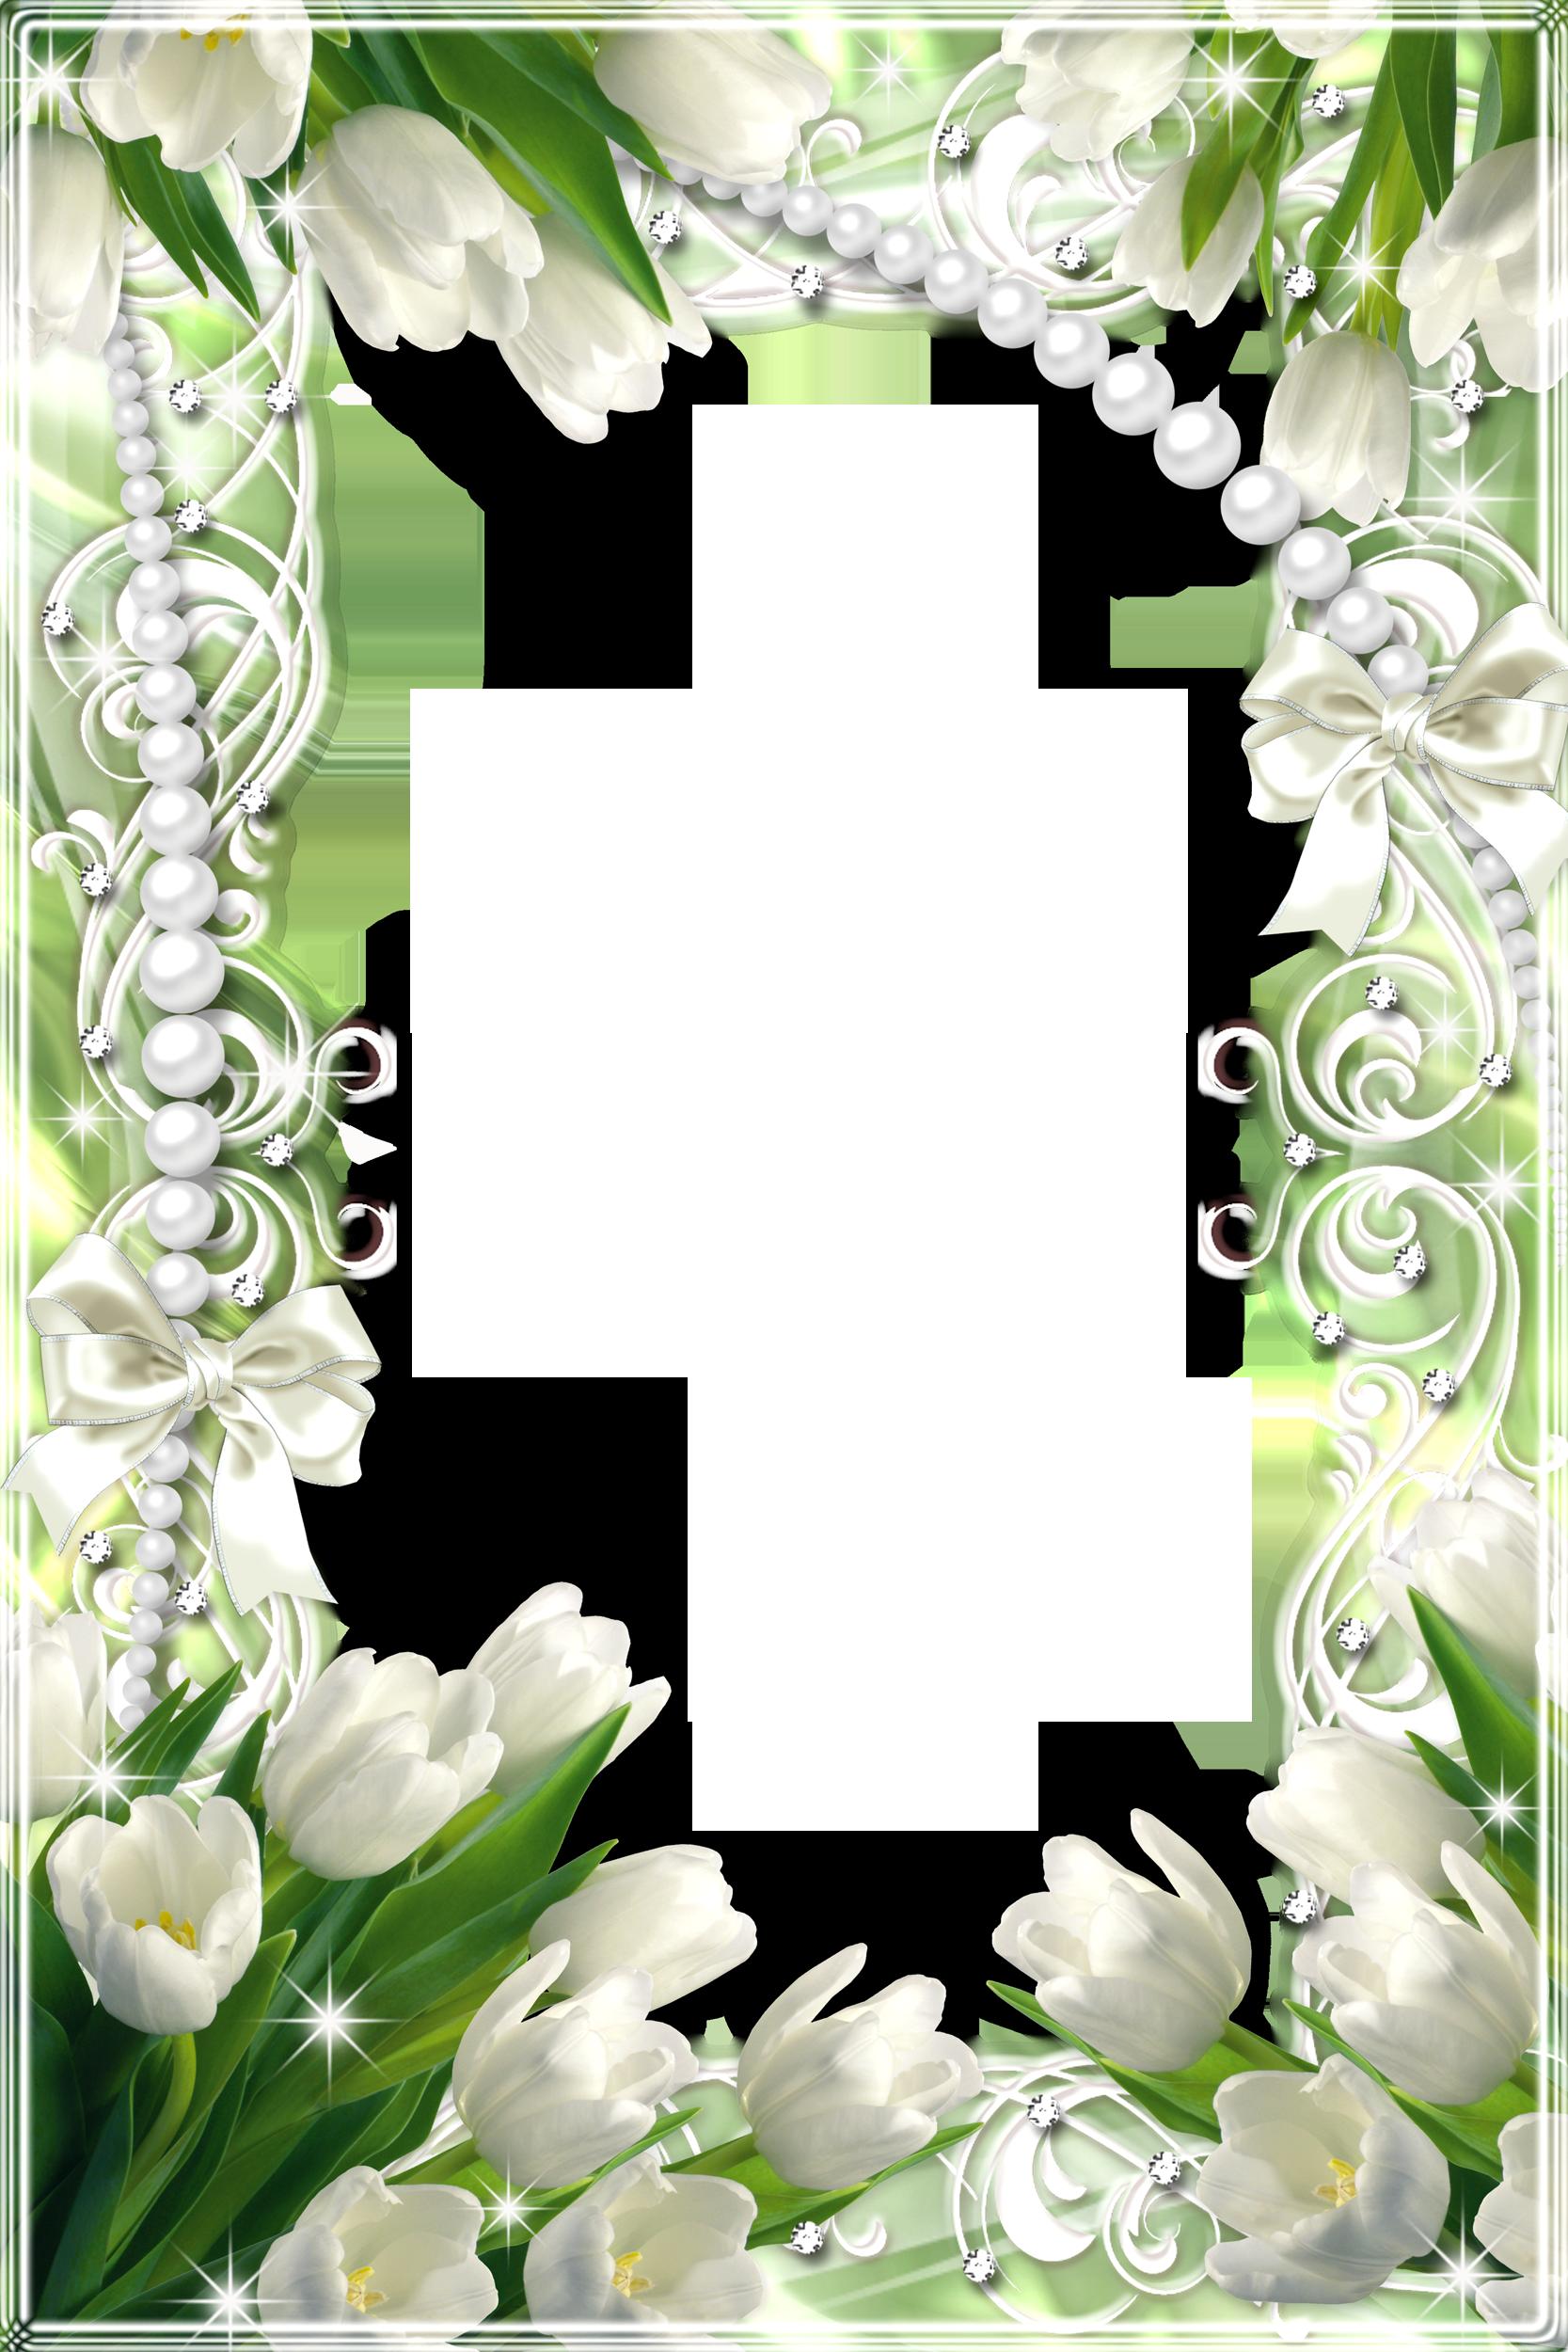 http://img-fotki.yandex.ru/get/4121/41771327.353/0_877f0_38f02eb0_orig.png